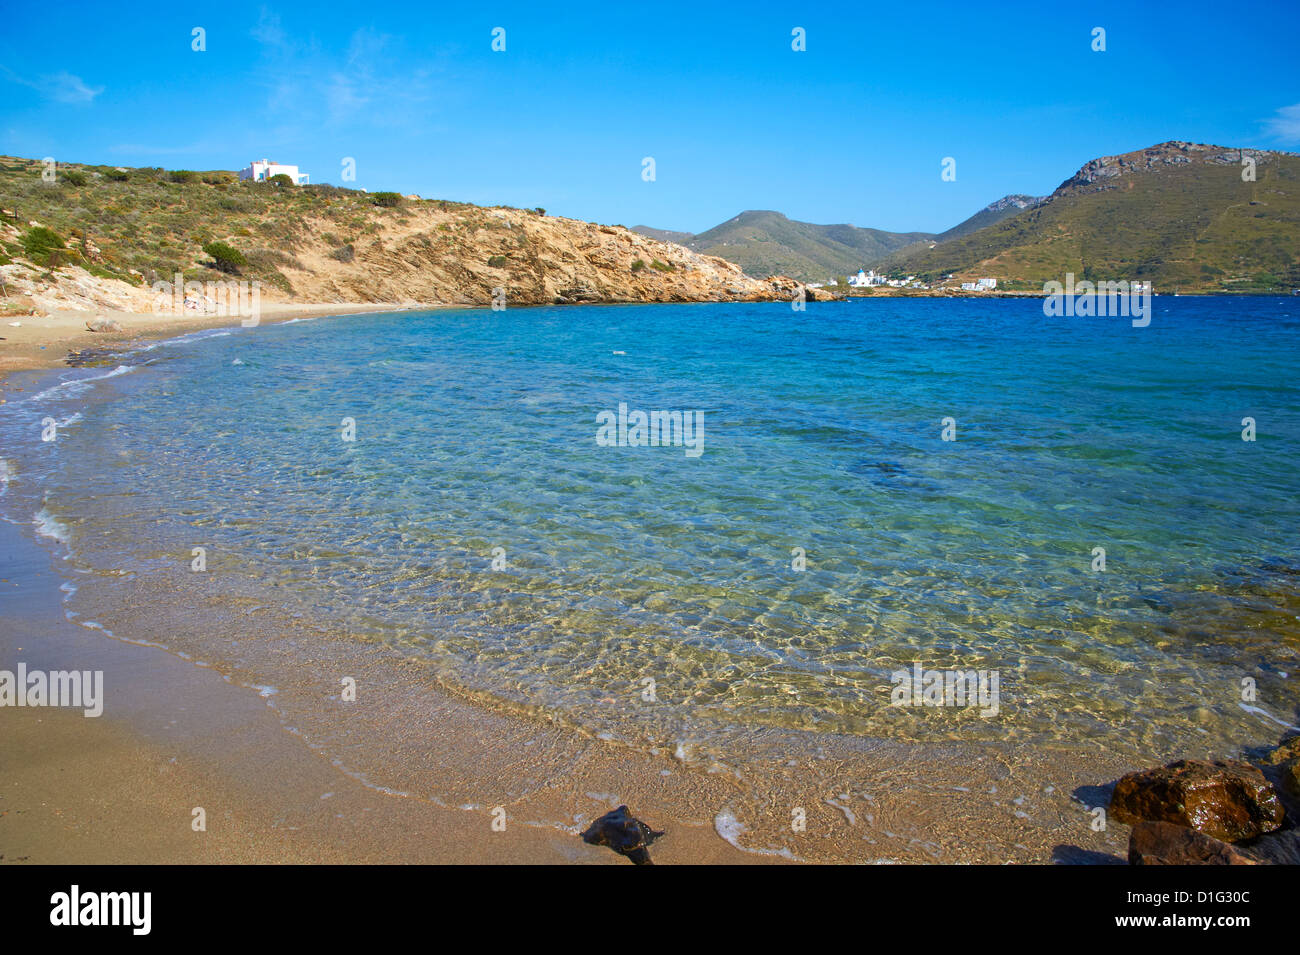 Beach, Agios Panteleimon, Amorgos, Cyclades, Aegean, Greek Islands, Greece, Europe - Stock Image